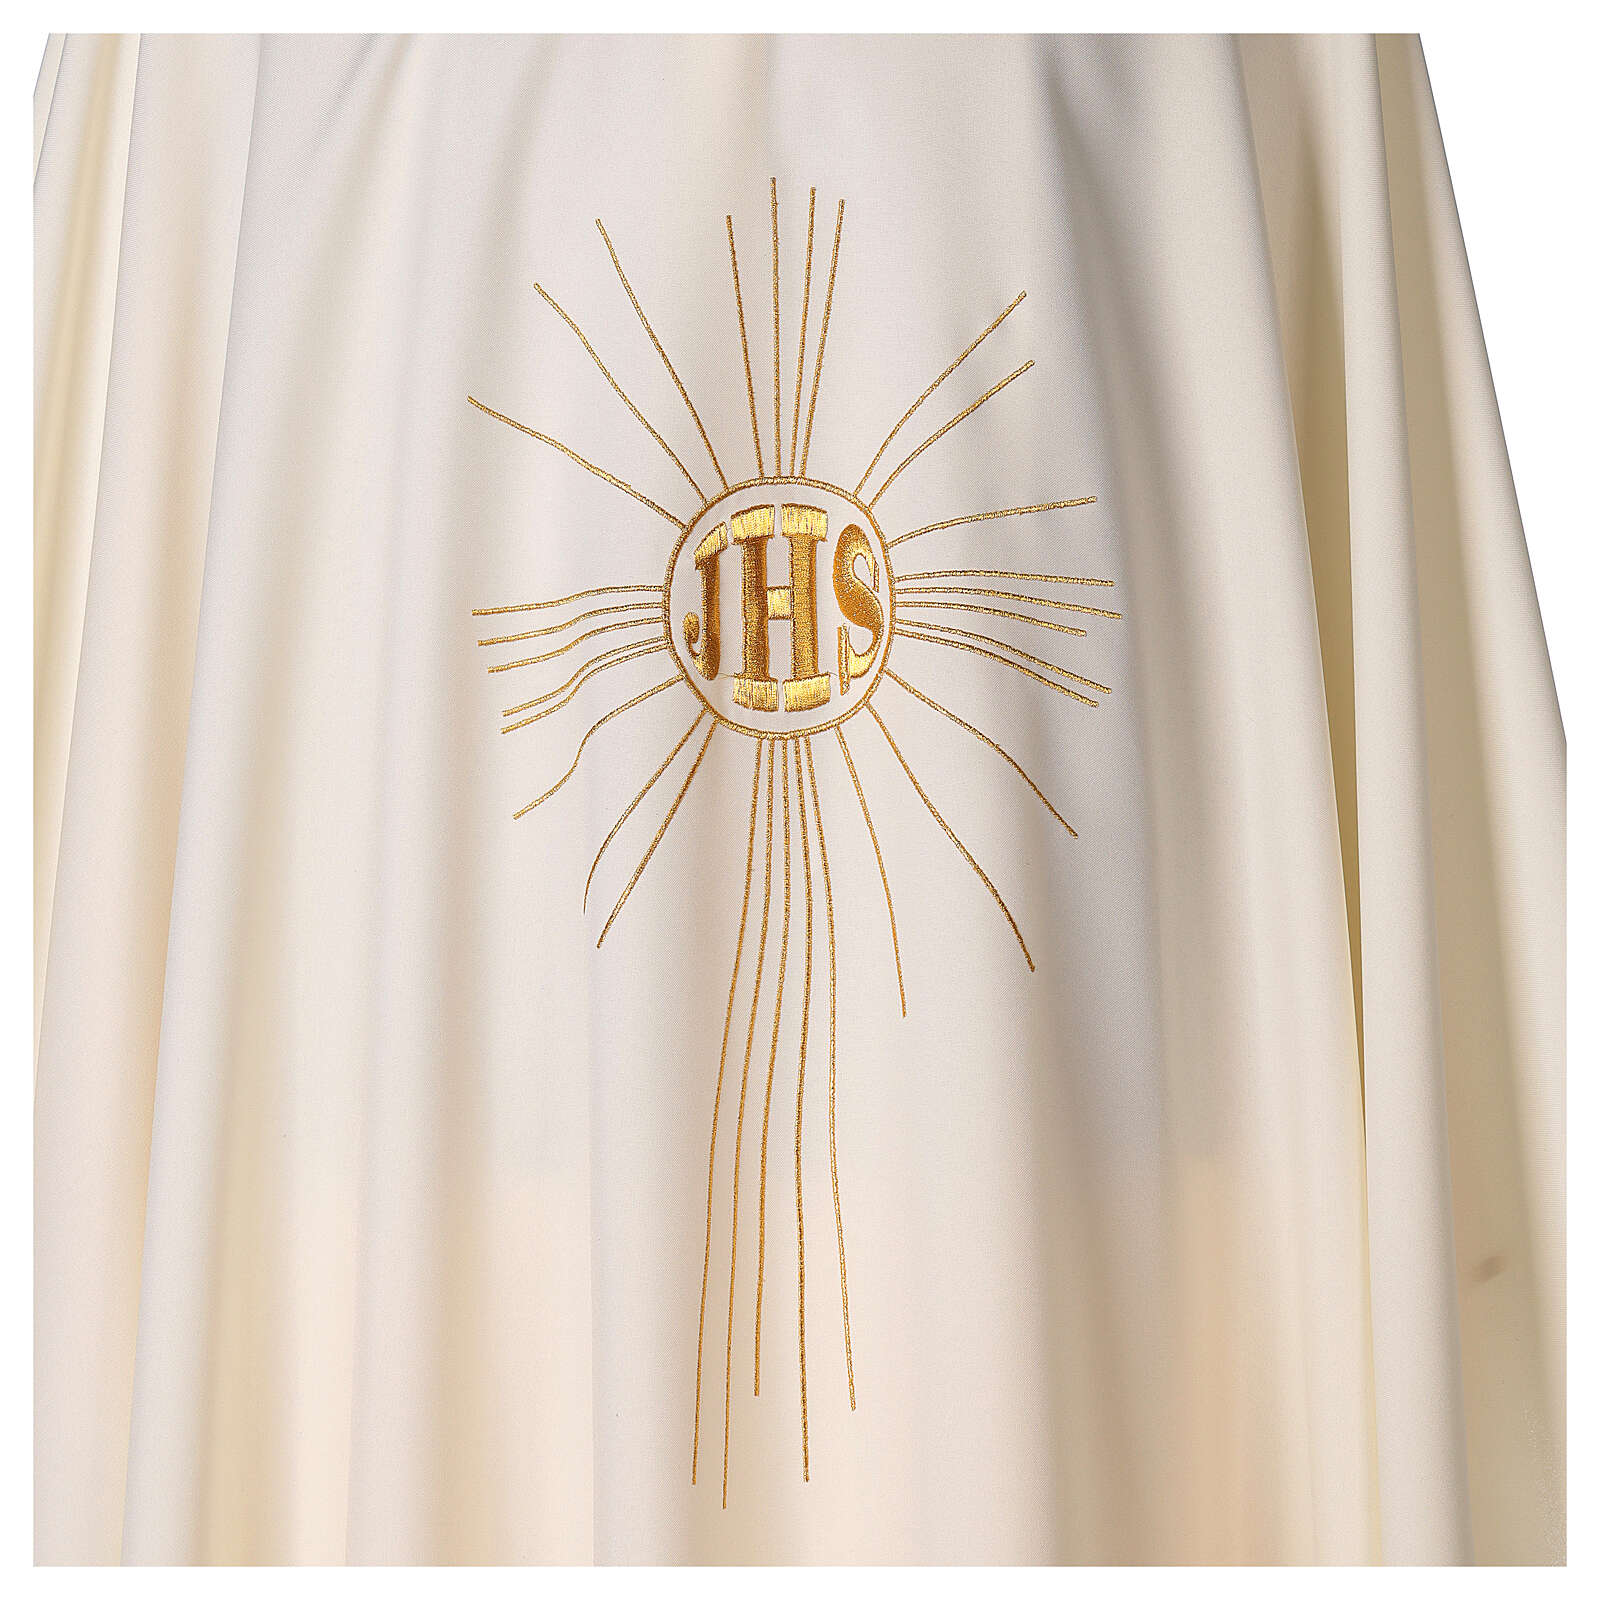 Ornat krepa poliester z promieniami i symbolem JHS 4